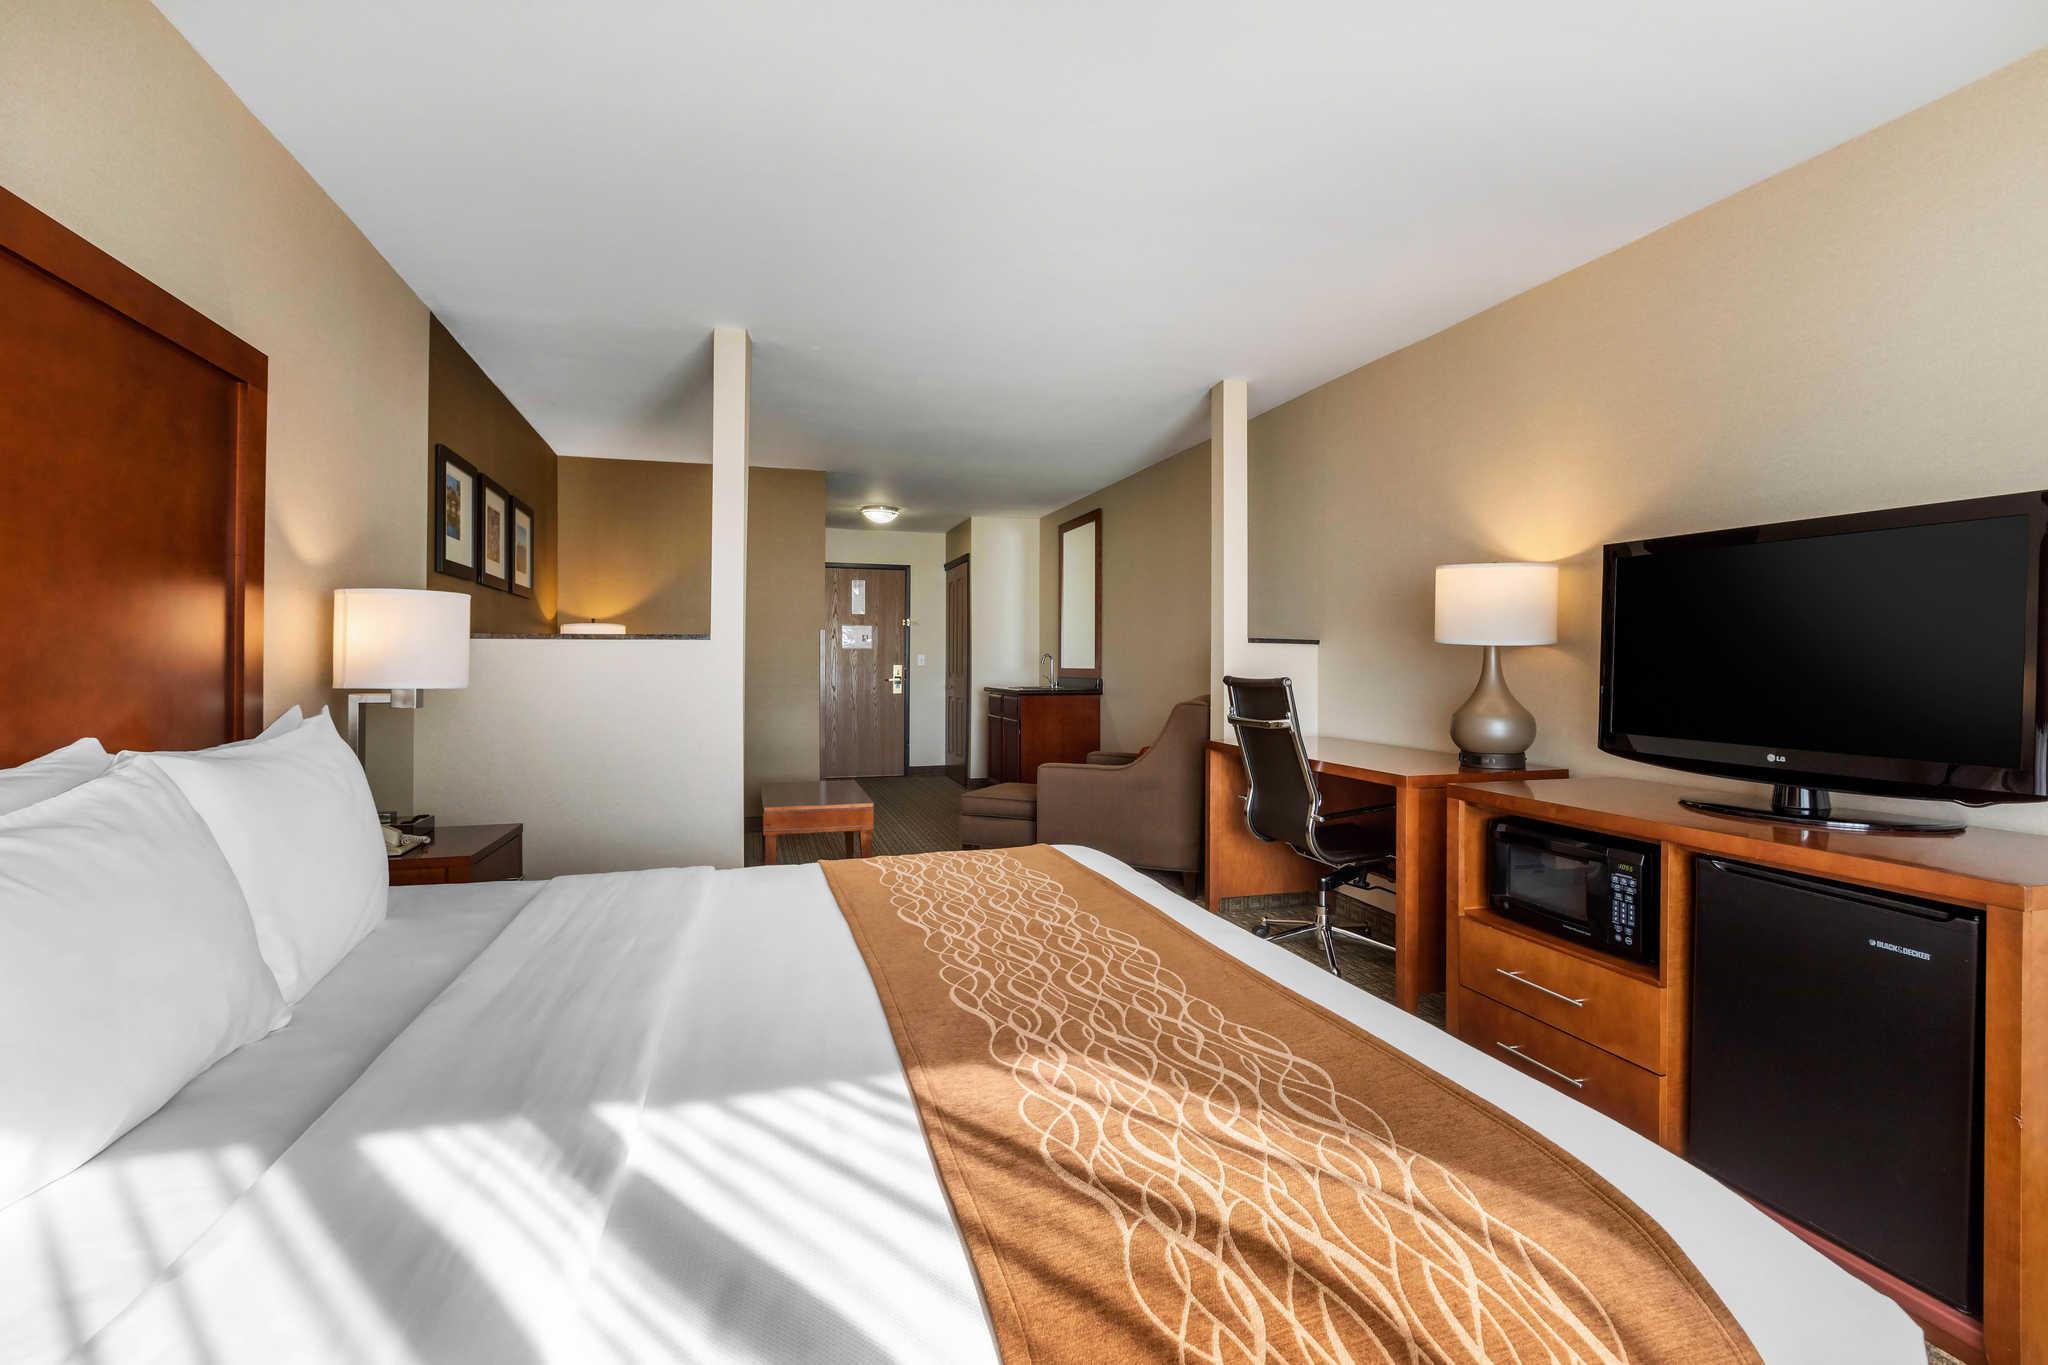 Comfort Inn & Suites Murrieta Temecula Wine Country image 21